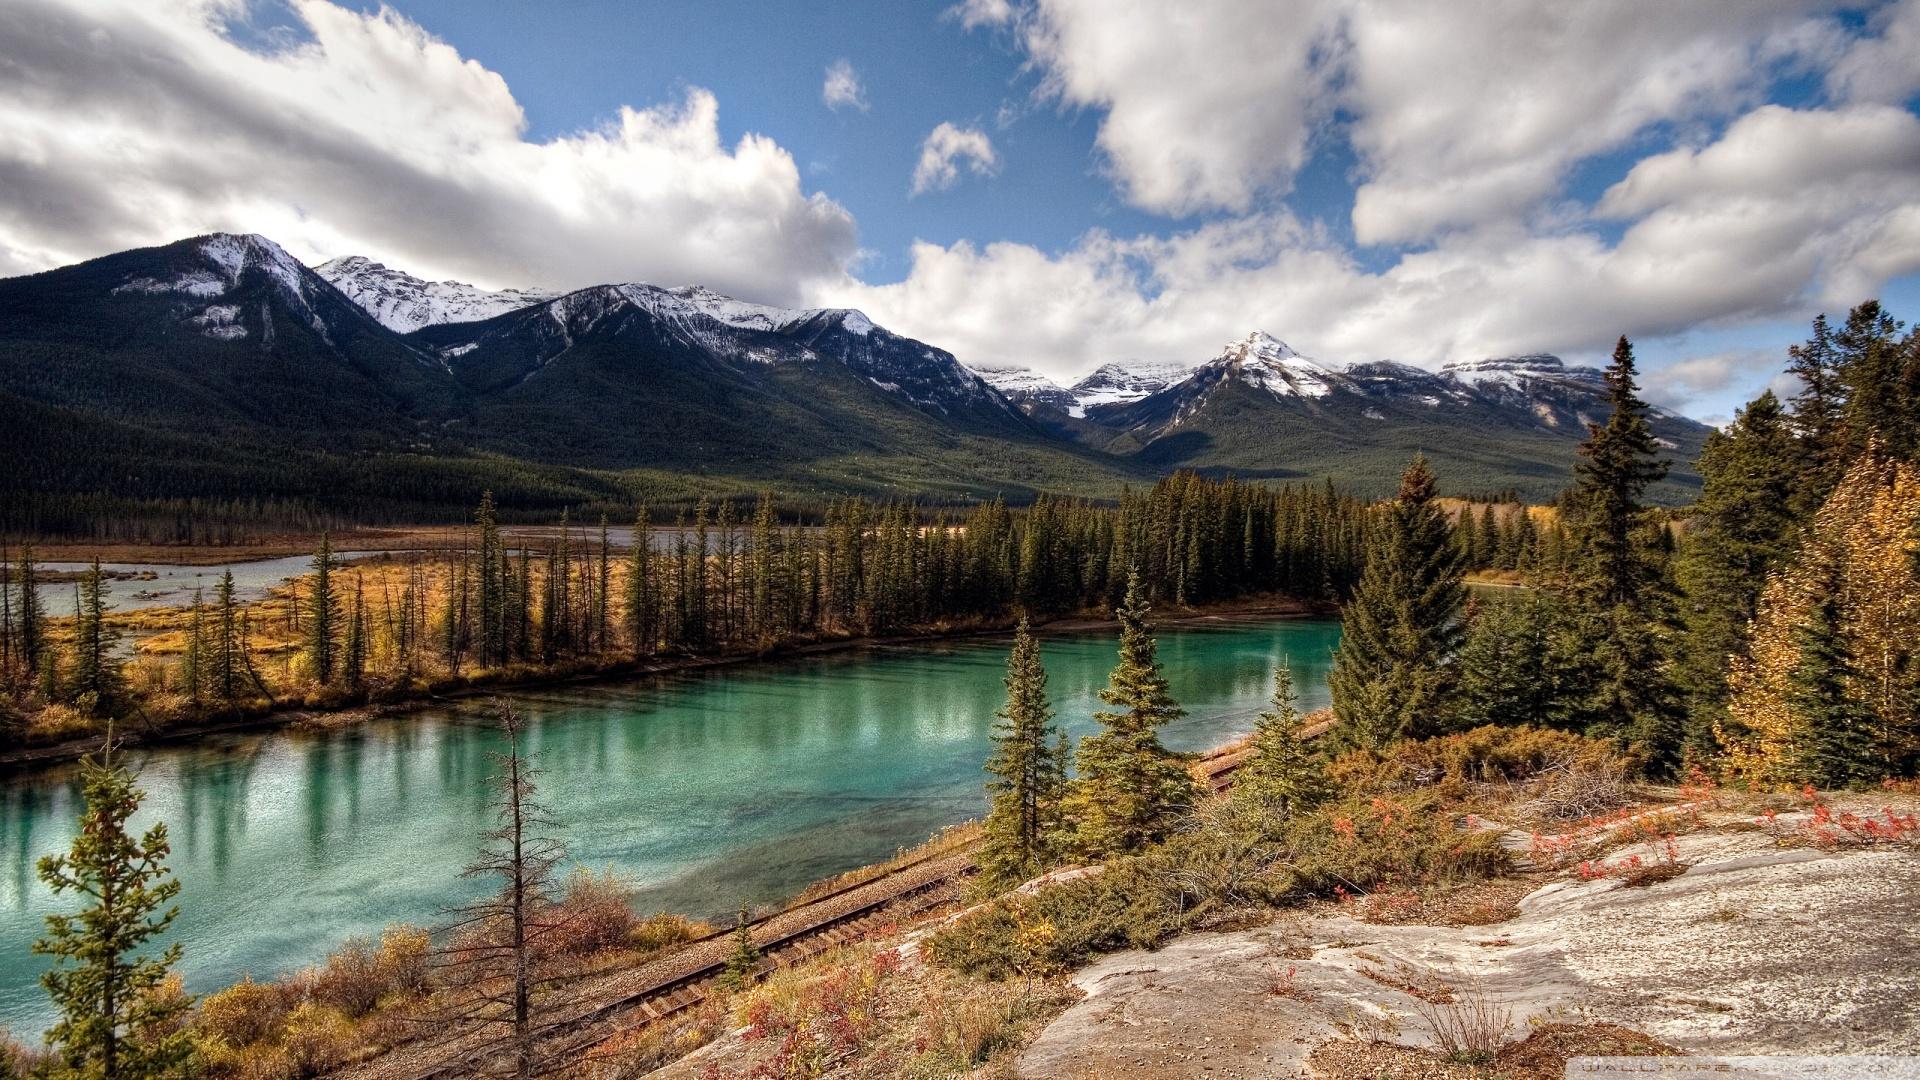 Alberta Canada Wallpaper 1920x1080 Banff National Park Alberta 1920x1080